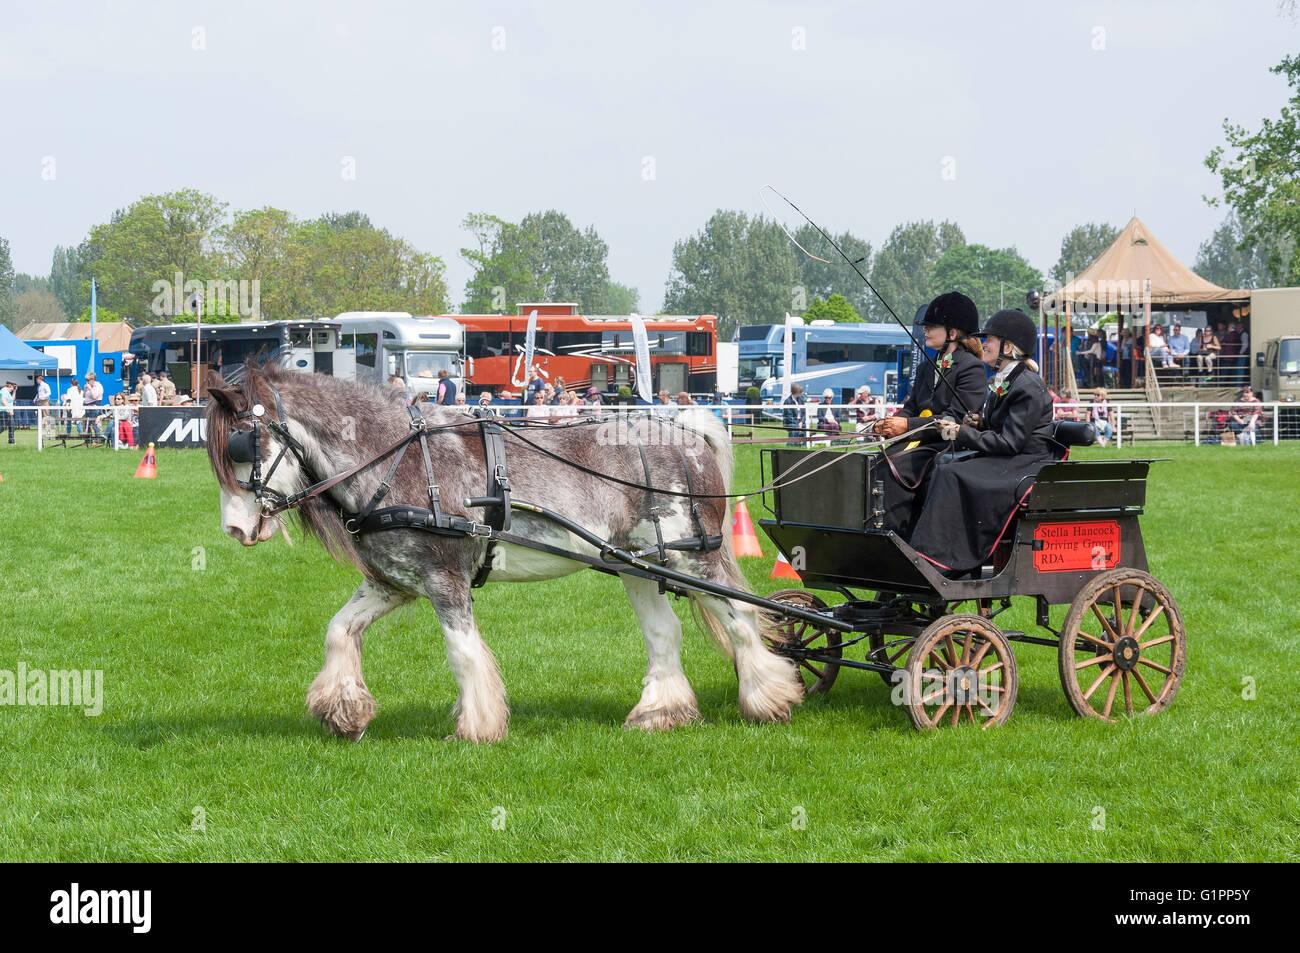 Mini Horse Carriage Riding At Royal Windsor Show Home Park Berkshire England United Kingdom